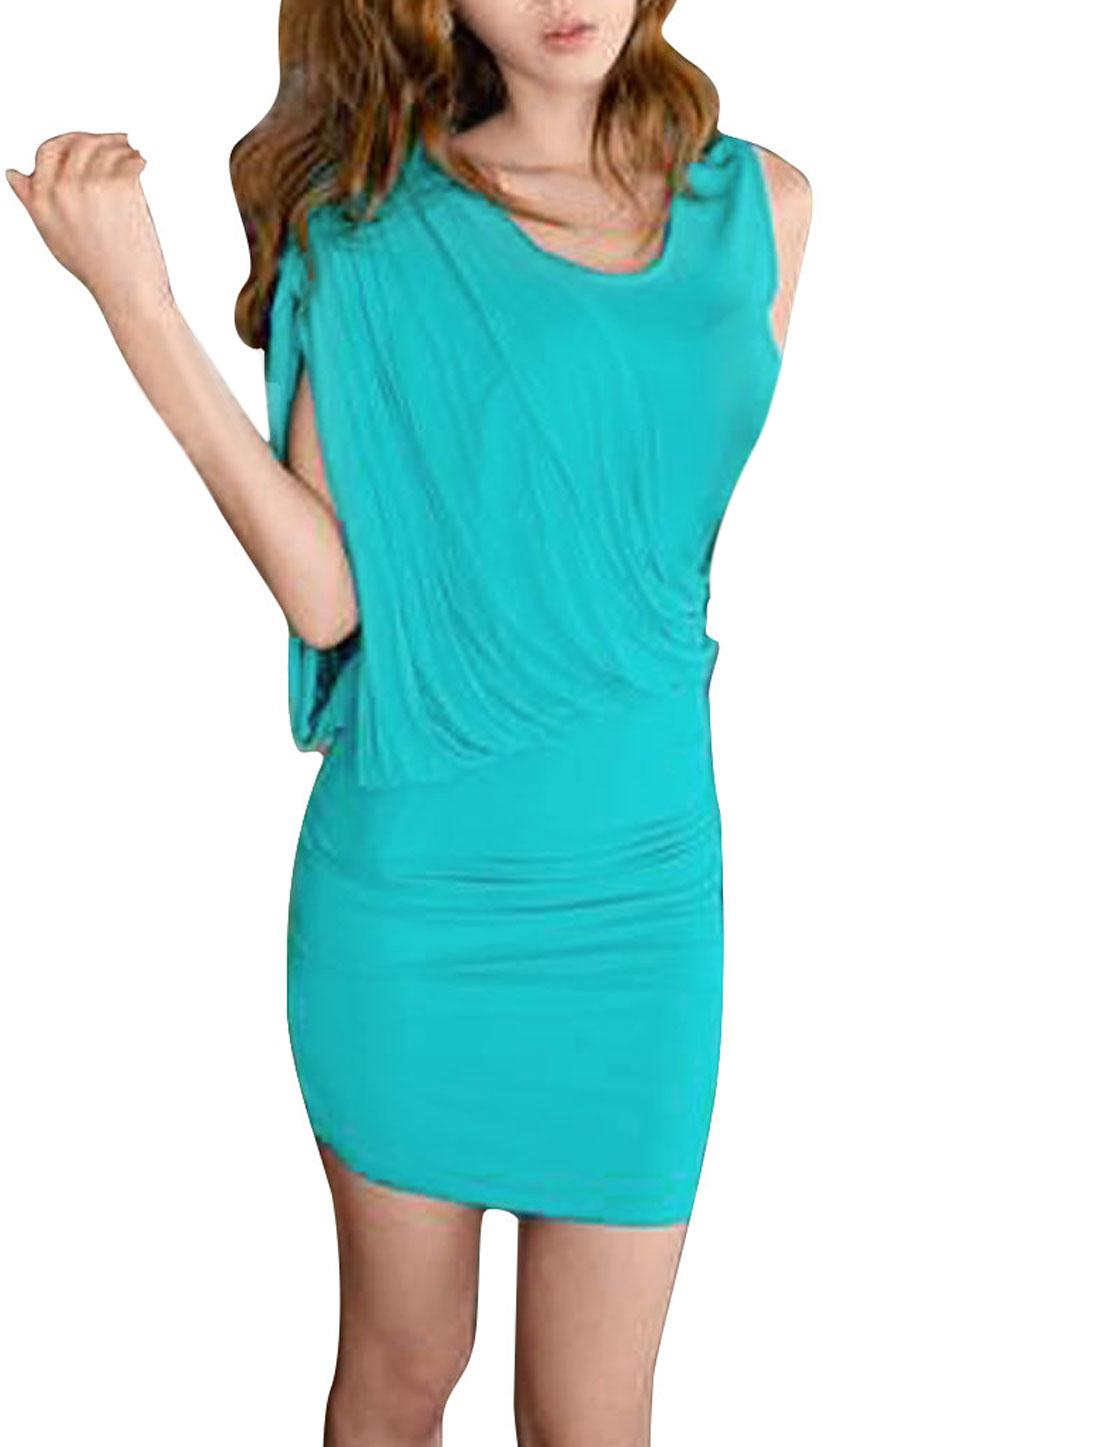 Ladies Light Blue Elastic Gathered Detail Asymmetric Mini Dress XS